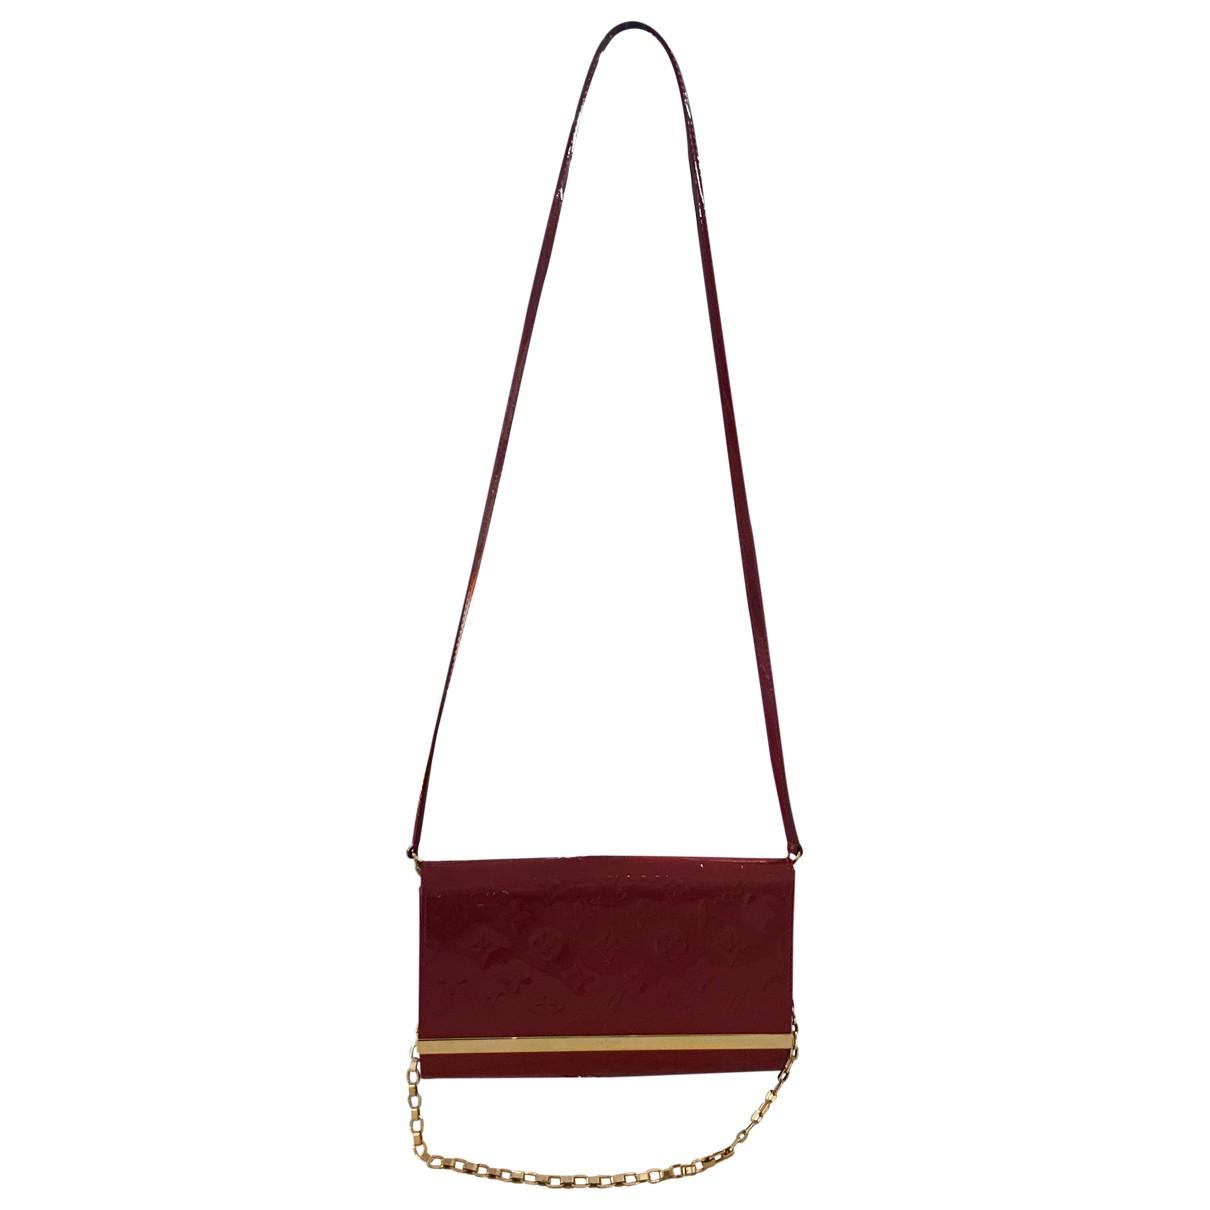 Louis Vuitton - Sac a main Ana pour femme en cuir verni - rouge